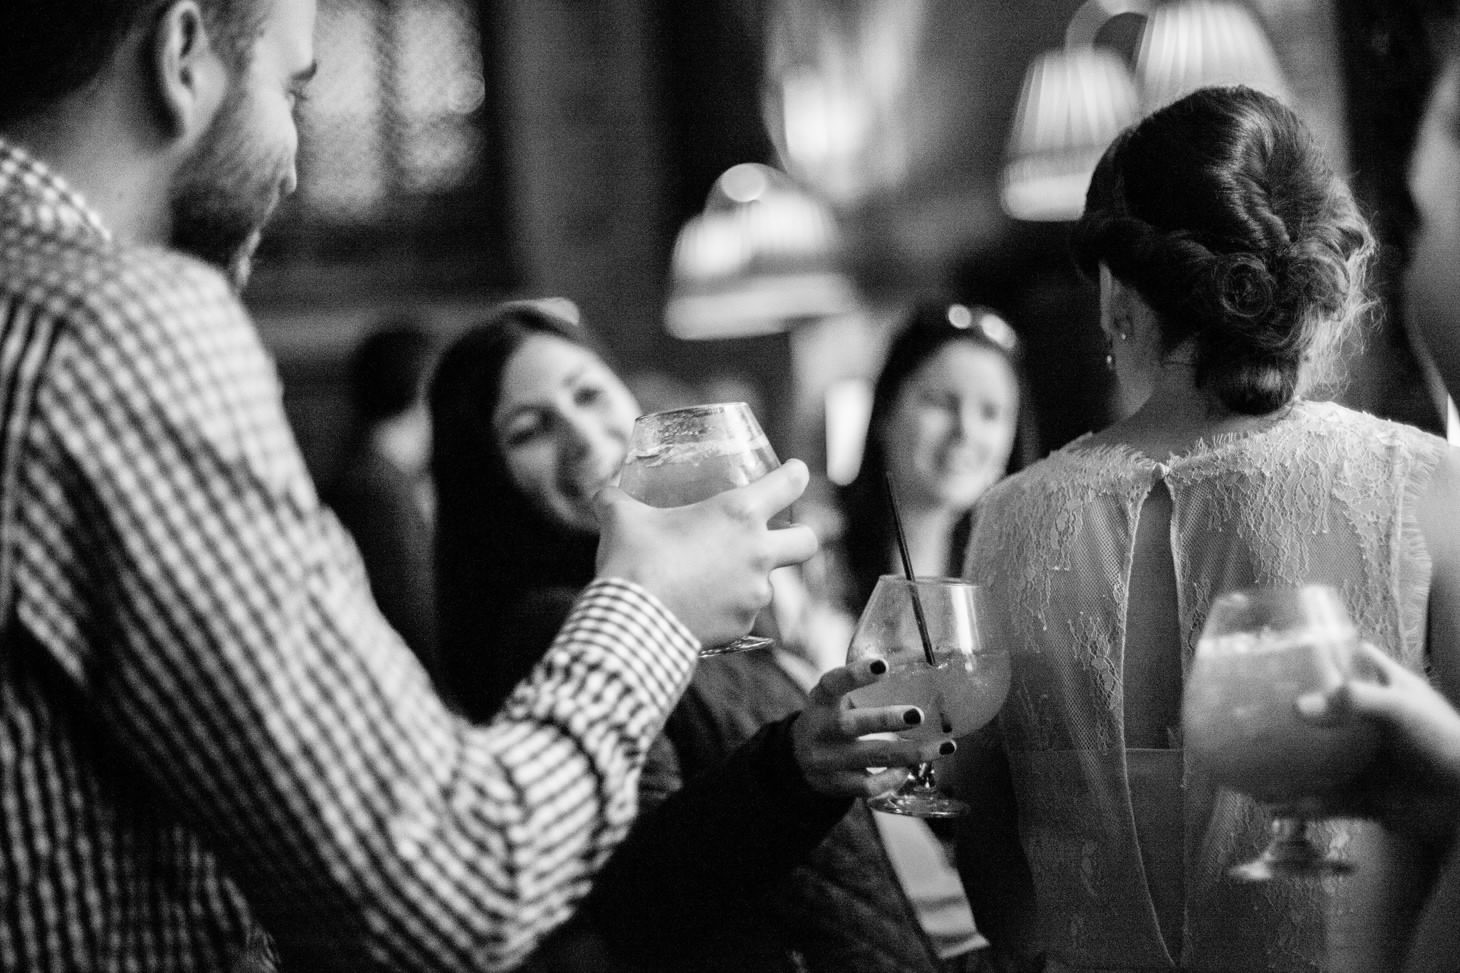 016-nyc-wedding-elopement-lgbt-friendly-photographer-city-hall-grand-central.jpg